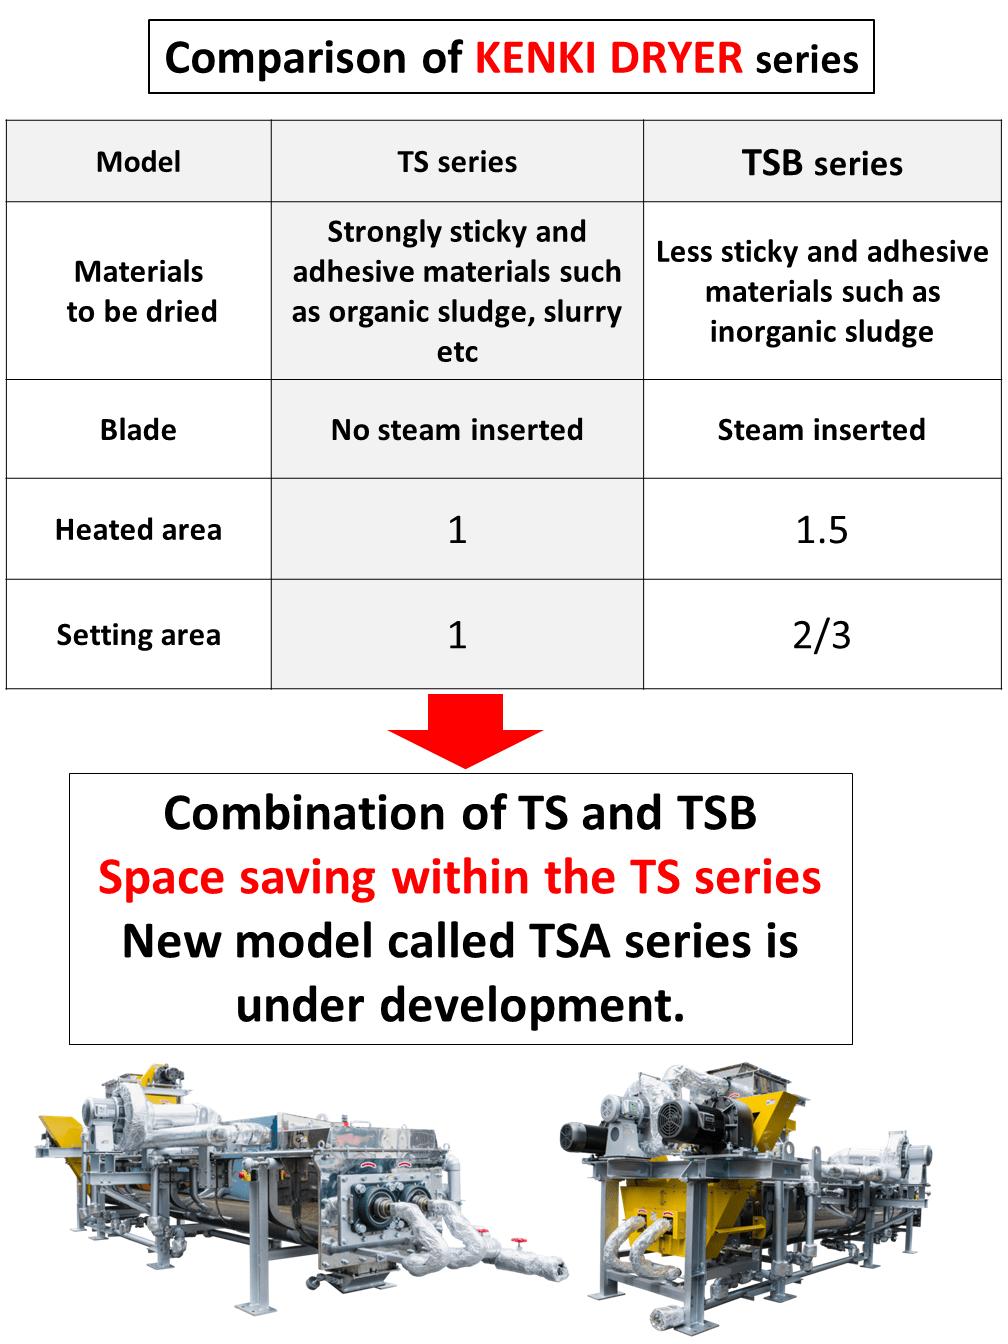 TS&TSB under development kenkidryer 5.12.2017